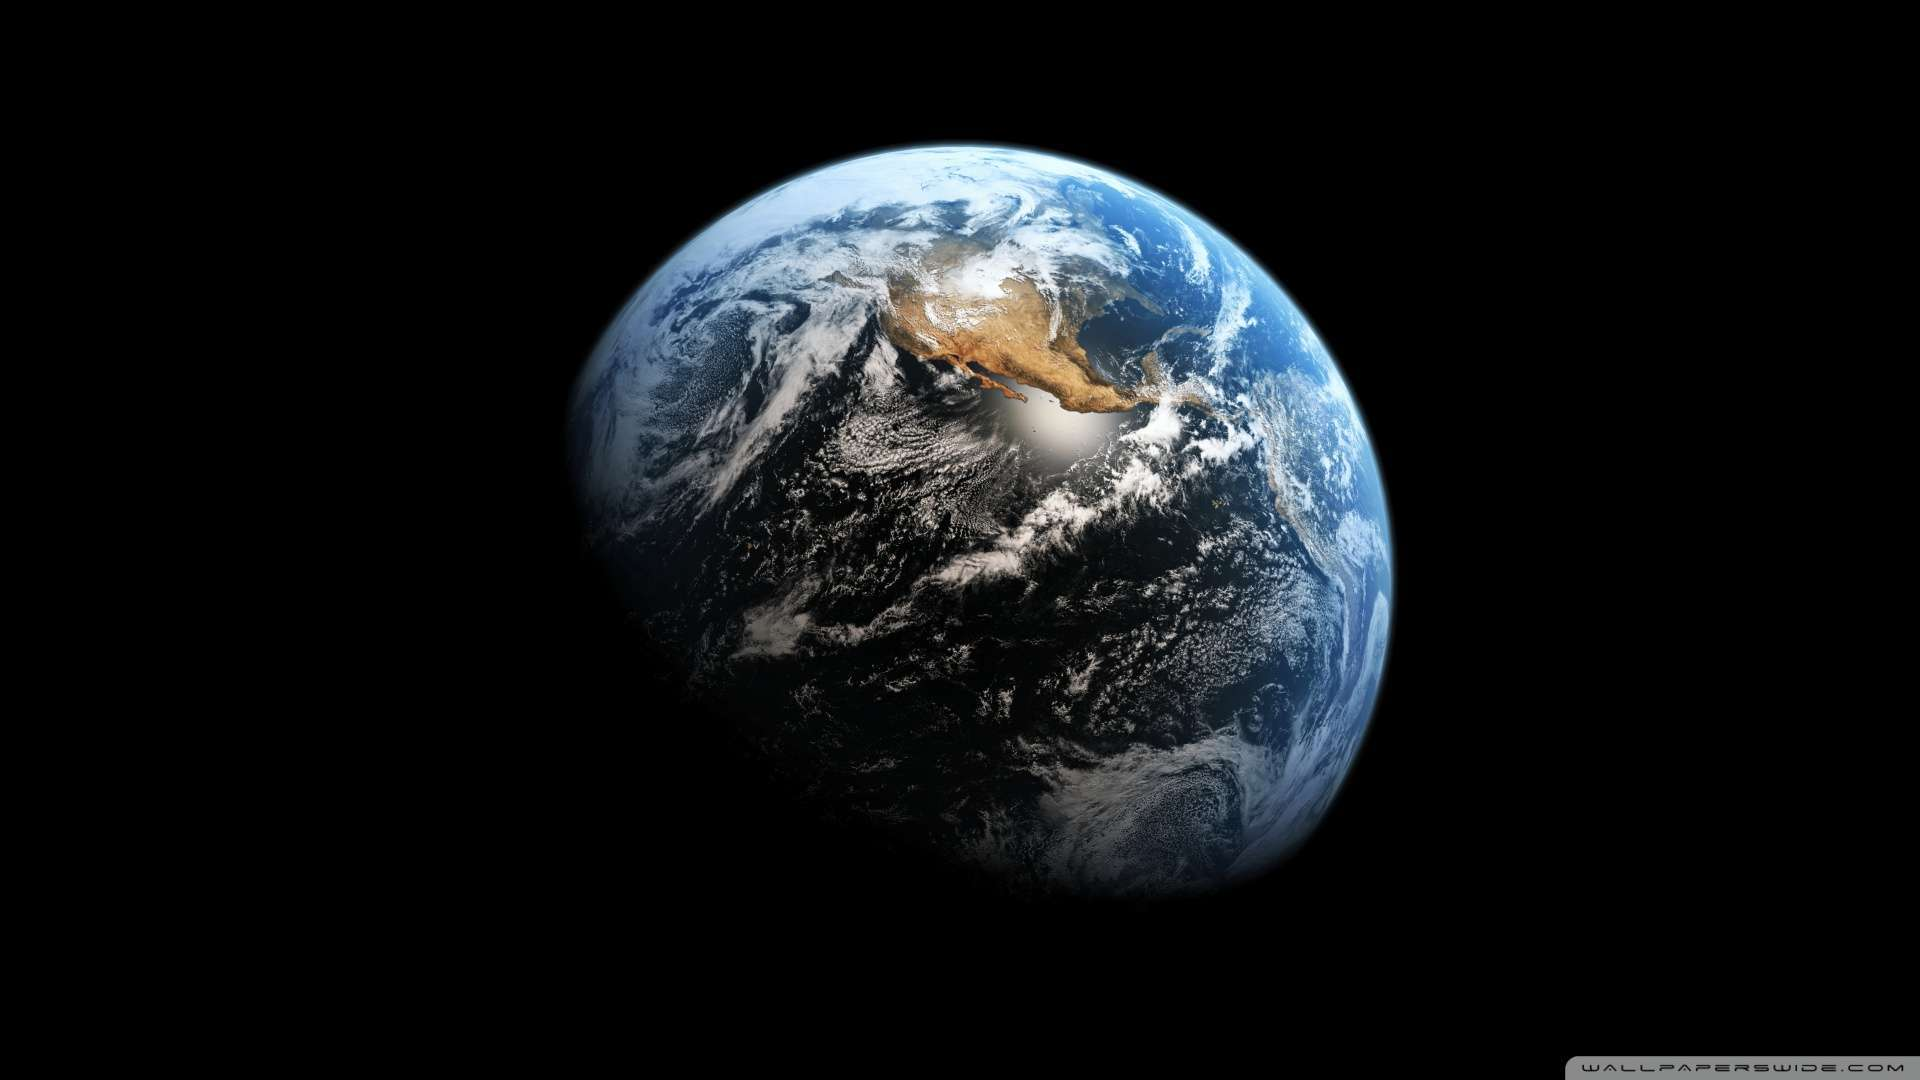 earth wallpaper hd 1080p - photo #3